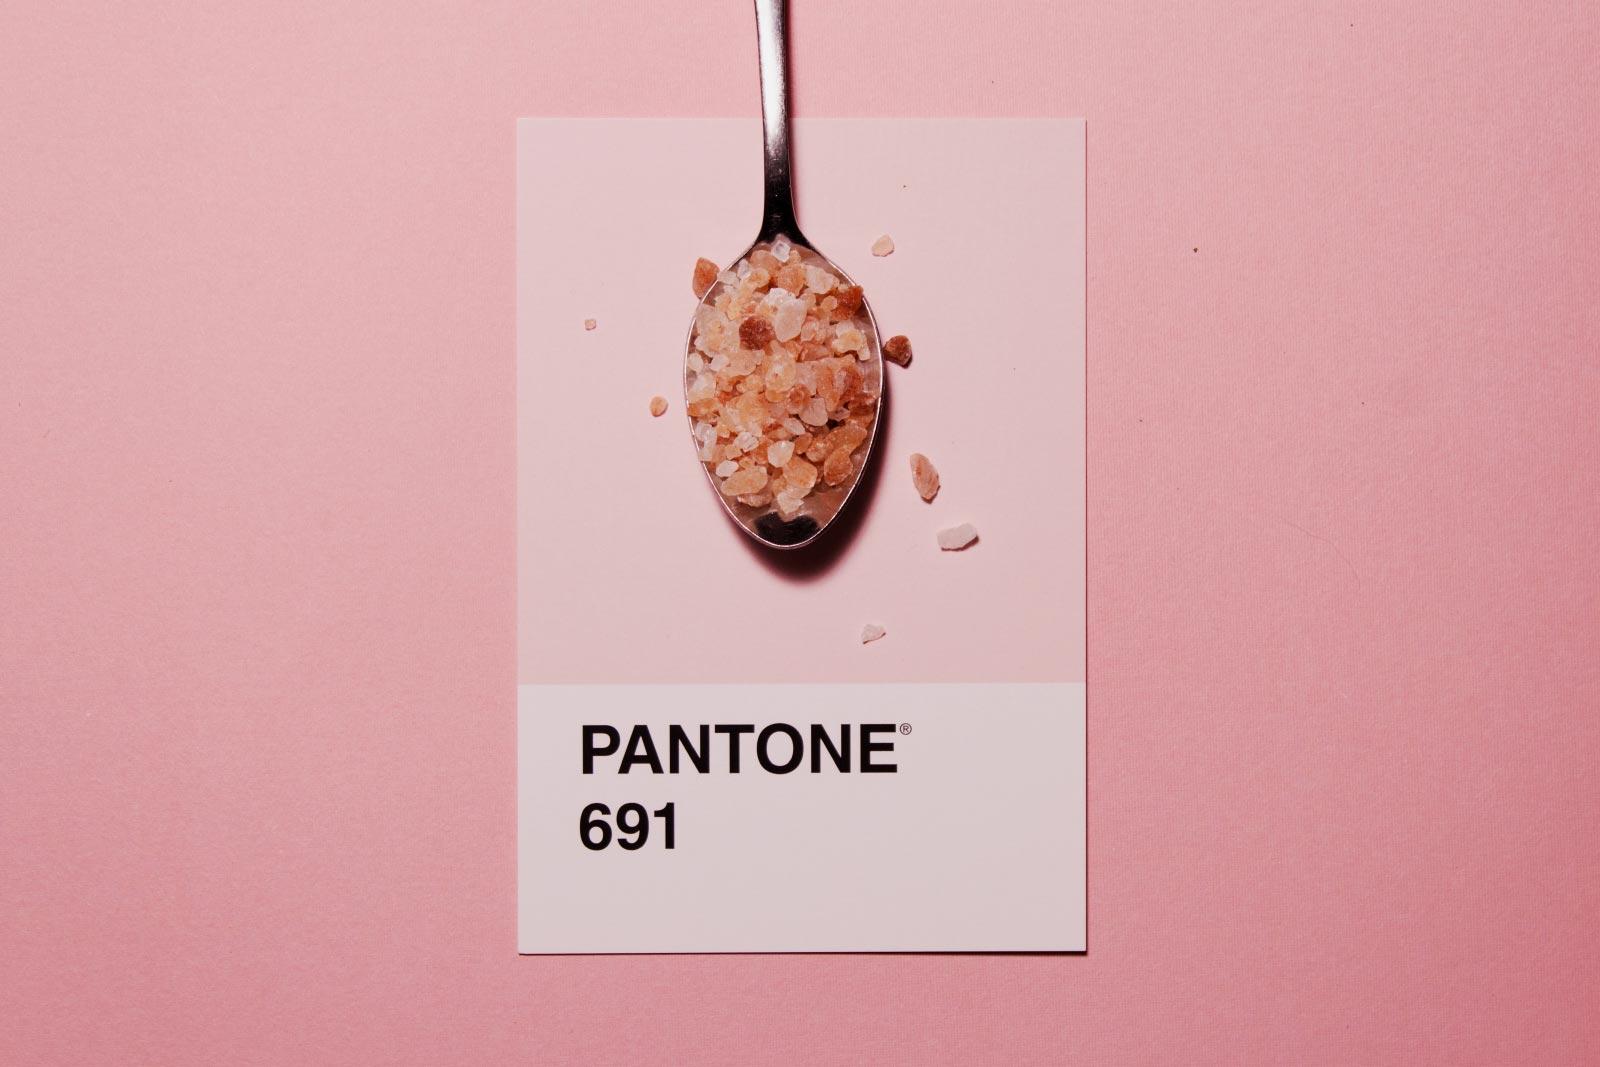 Pantone Color 691